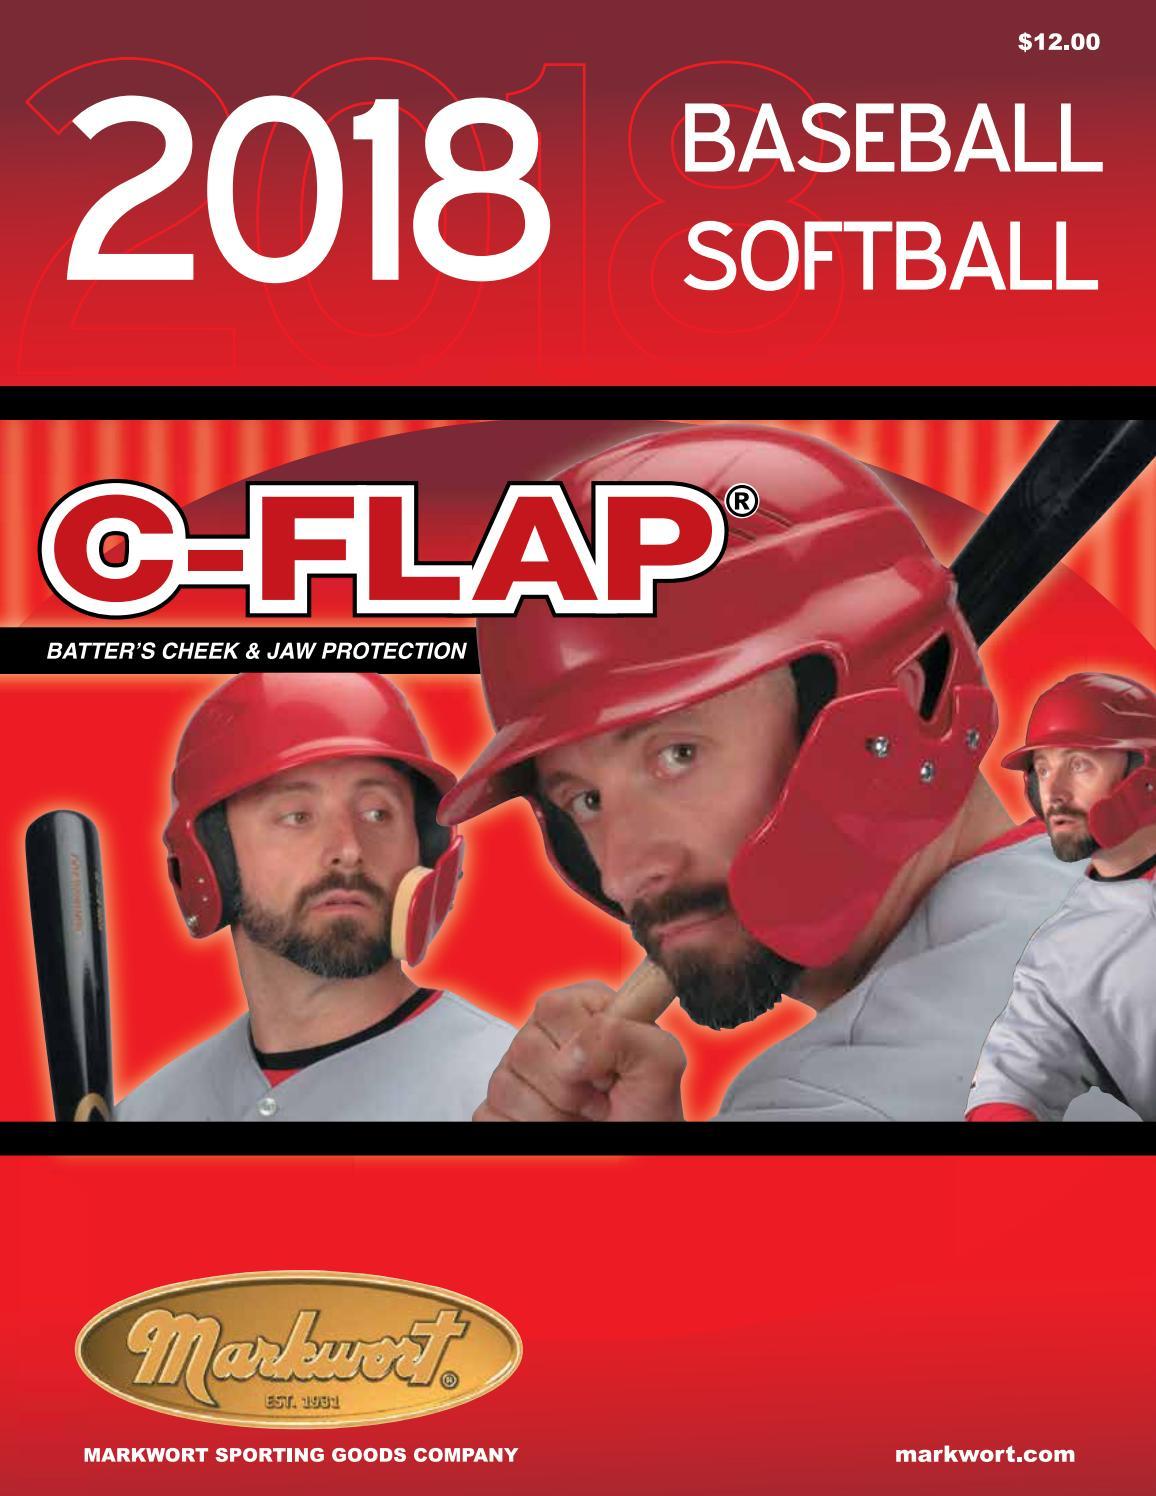 Markwort Sporting Goods Company 2018 Baseball Softball